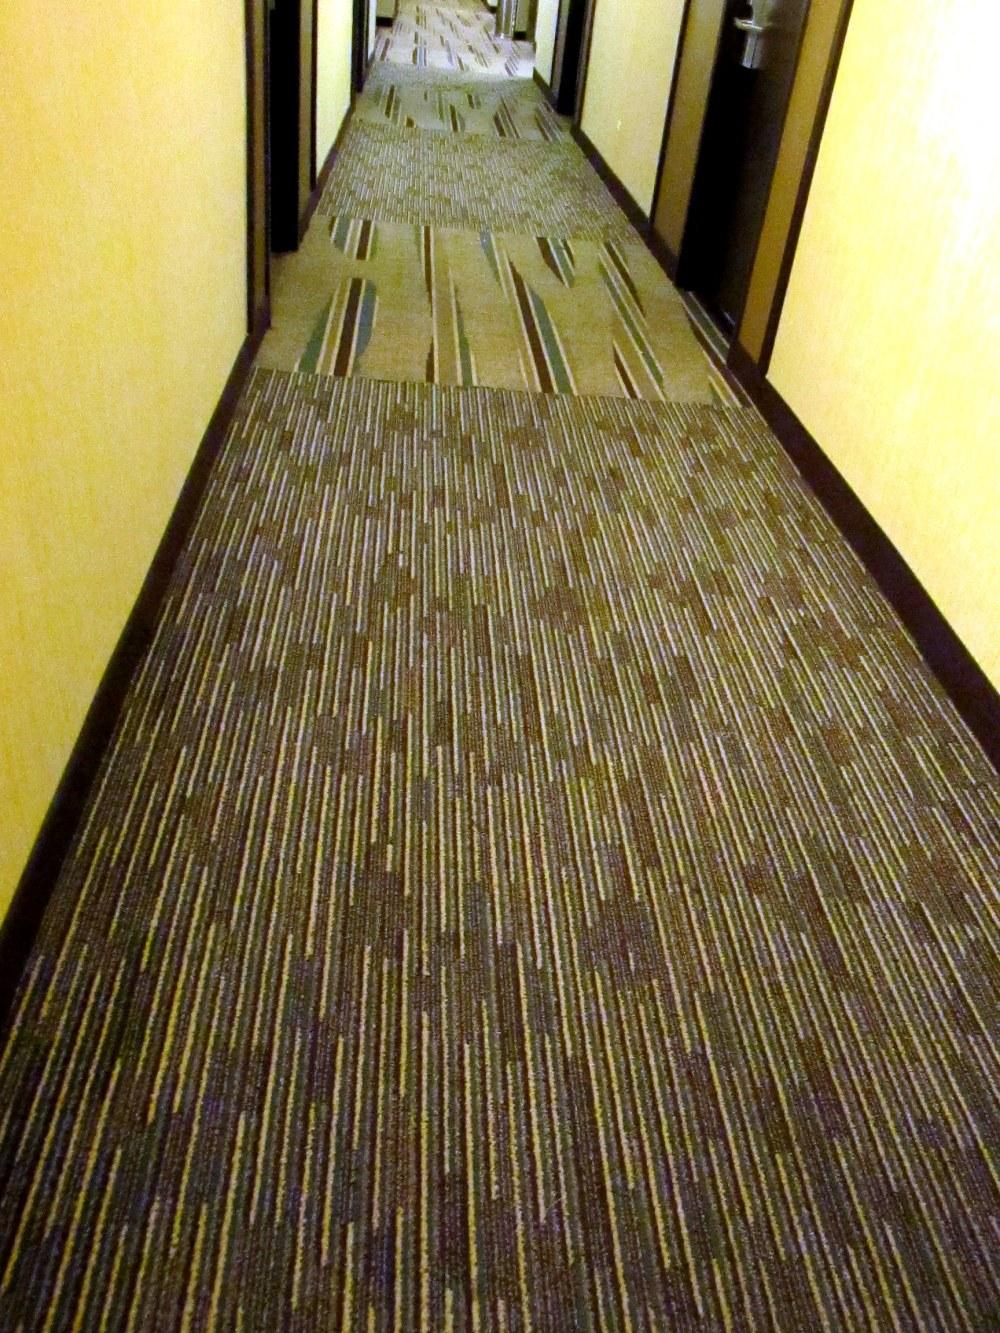 corridorcarpetHyattPlacehotelOwingsMillsMD15Oct2017